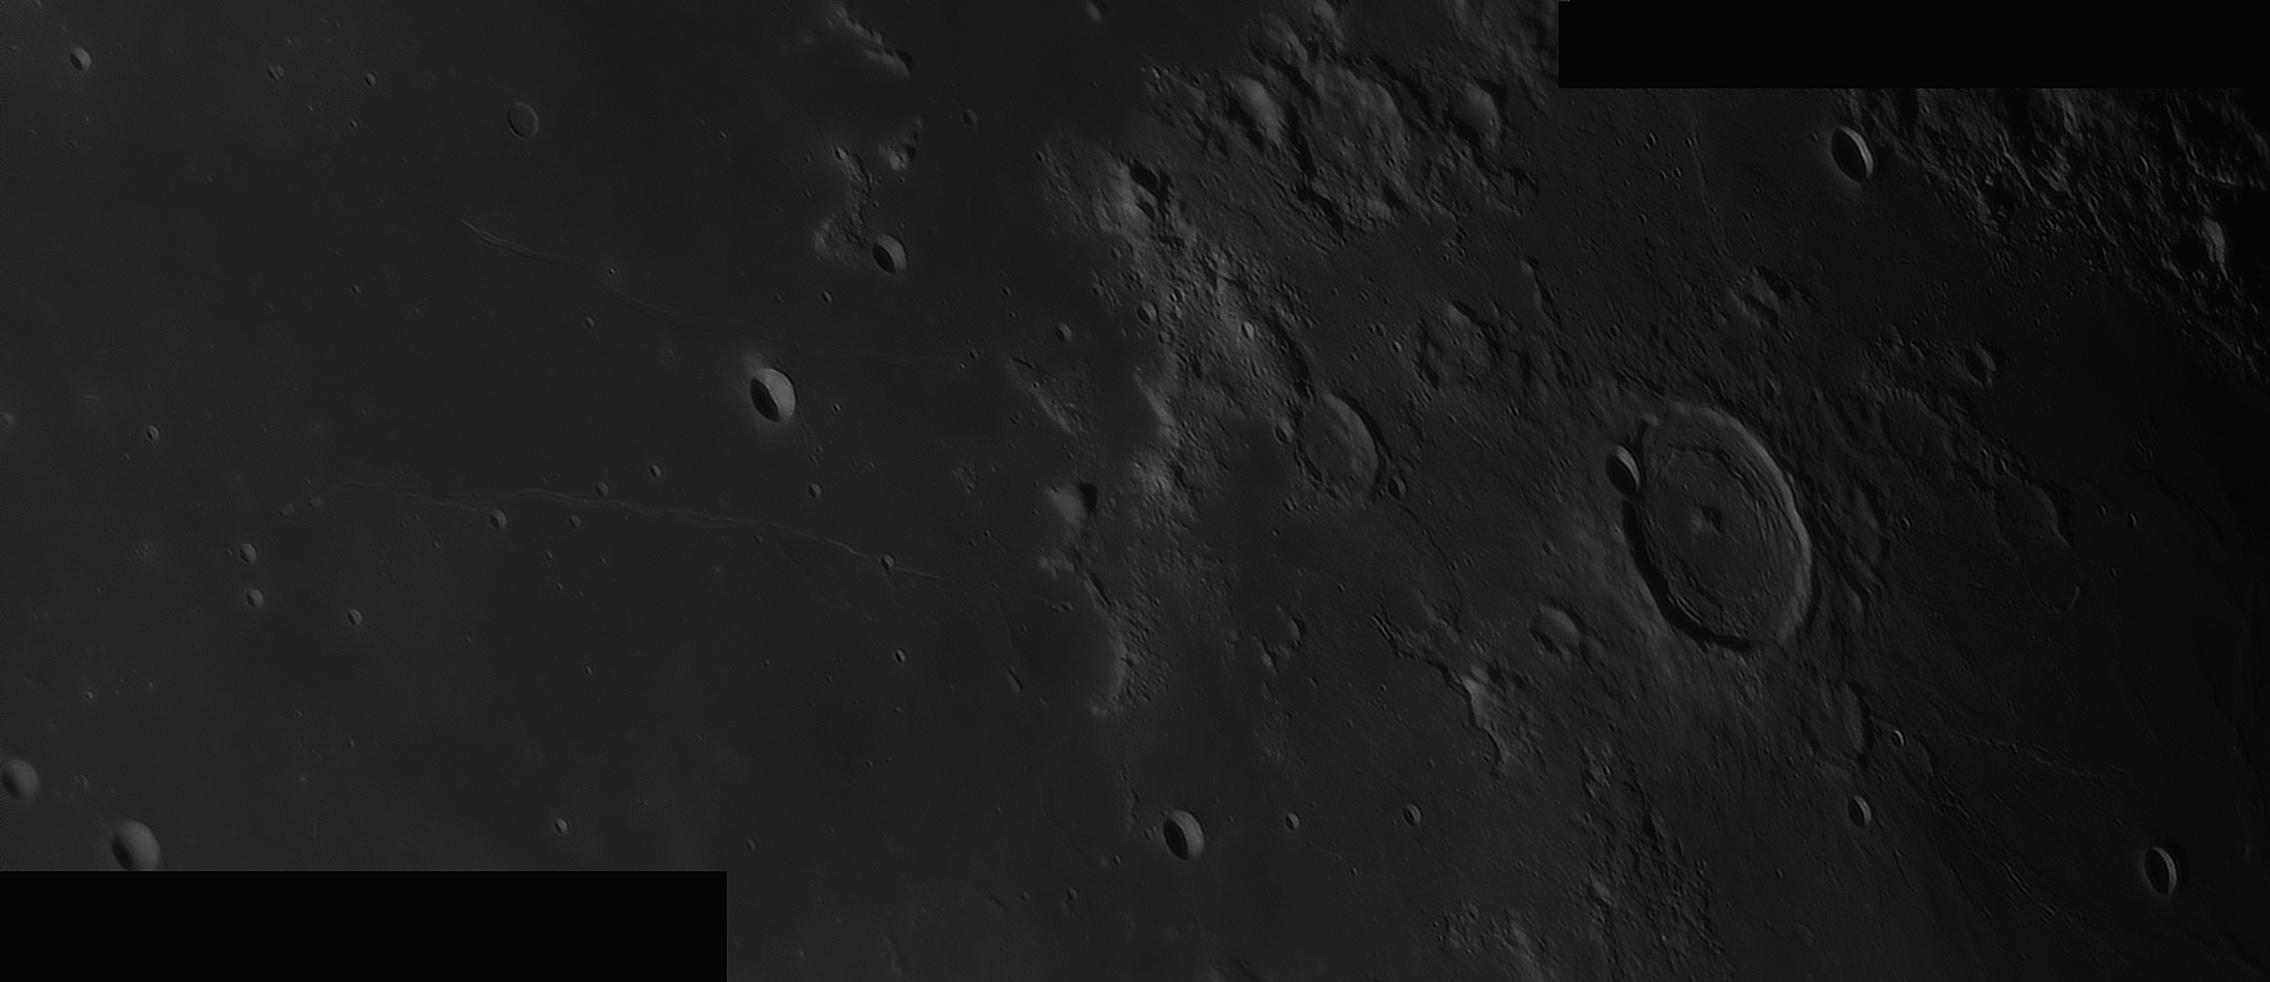 large.moon_17_09_2019_01_37_Rimae.jpg.baf342f23d7b5c10ca2bece3d39fc333.jpg